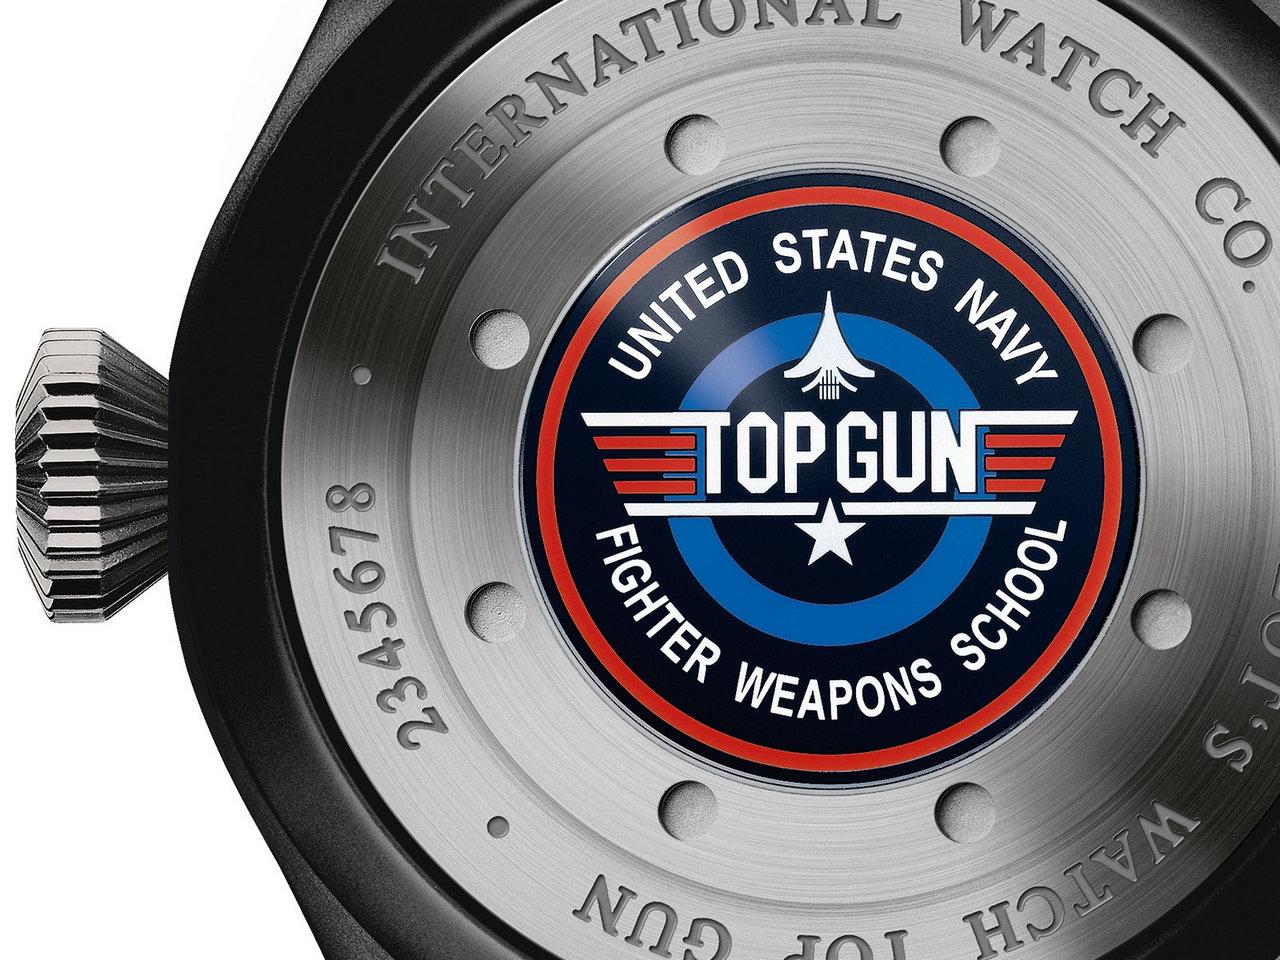 SIHH-2016-IWC-Big-Pilot-Watch-Perpetual-Calendar-TOP-GUN-IW502902-0-100_4